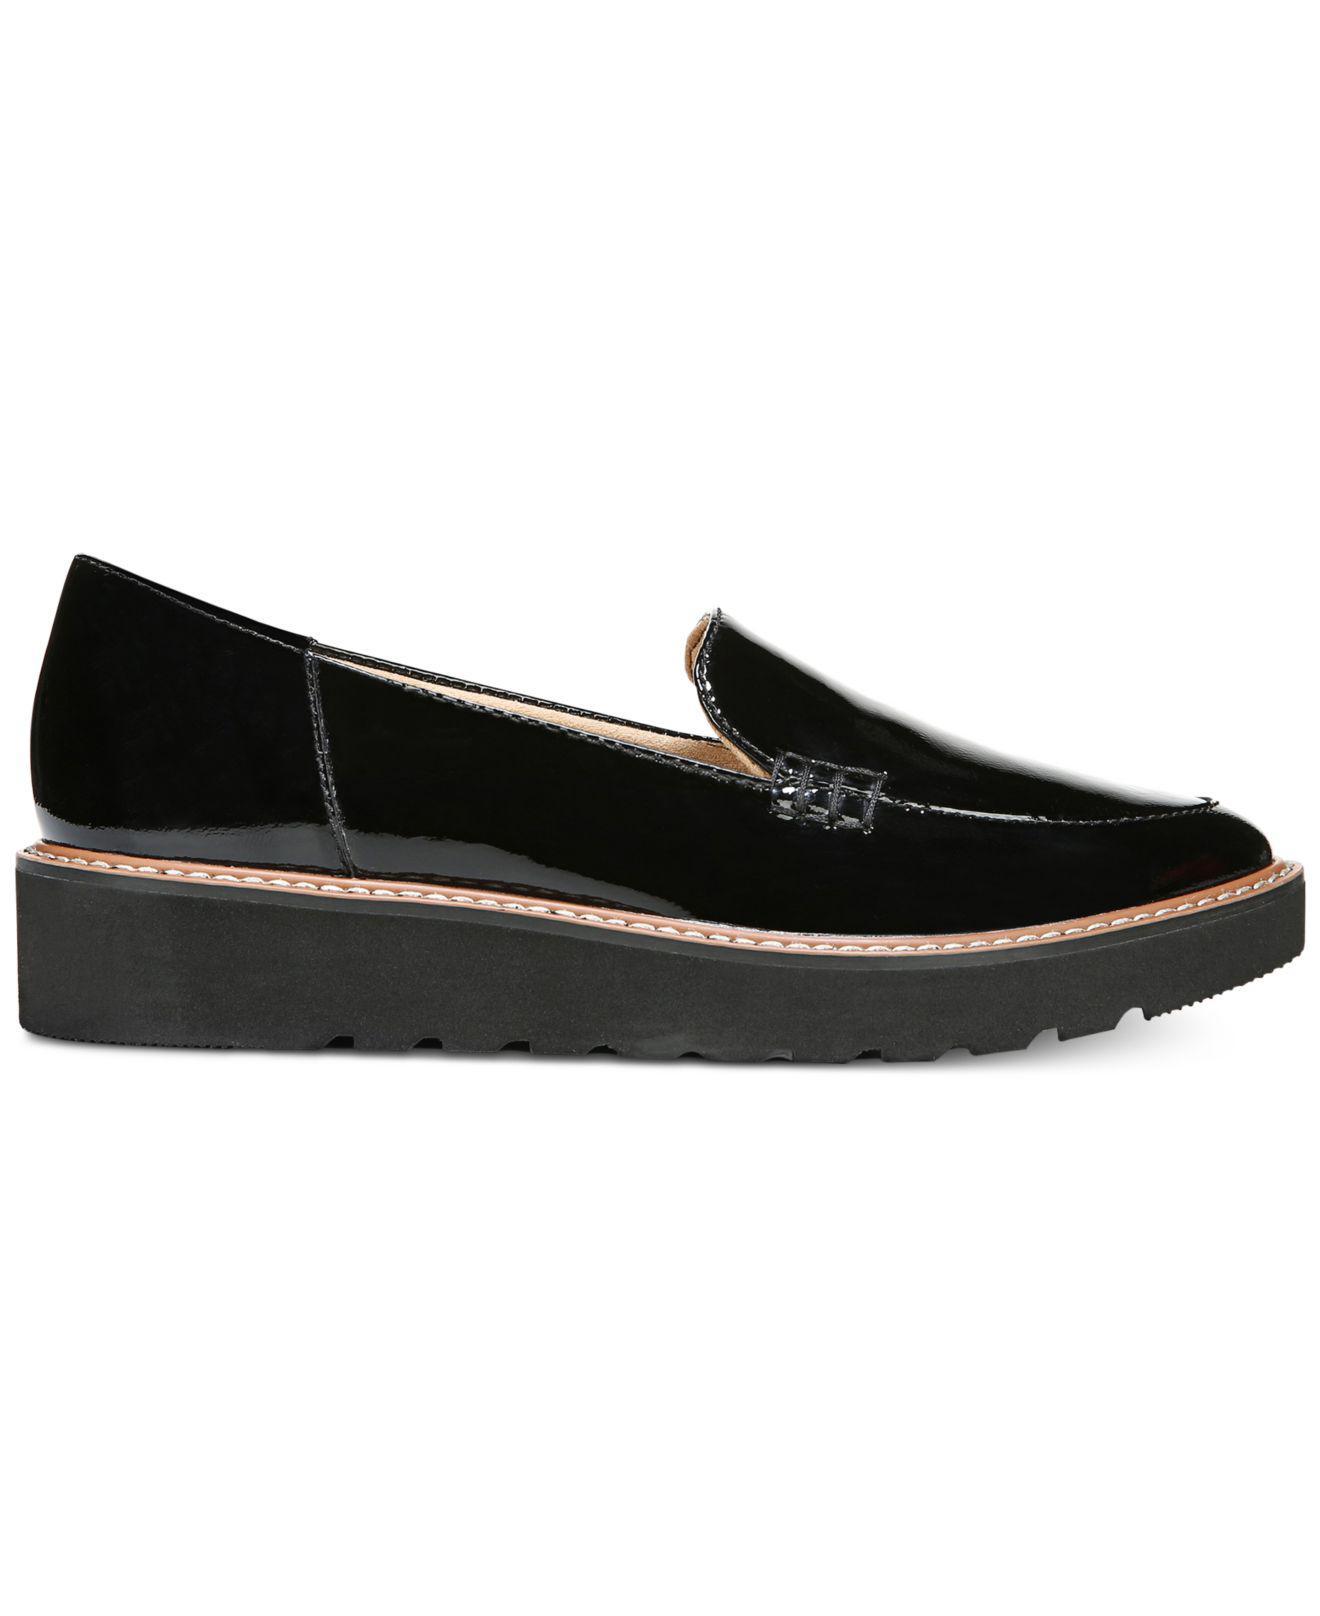 c4963316522 Naturalizer Andie Platform Loafers in Black - Lyst